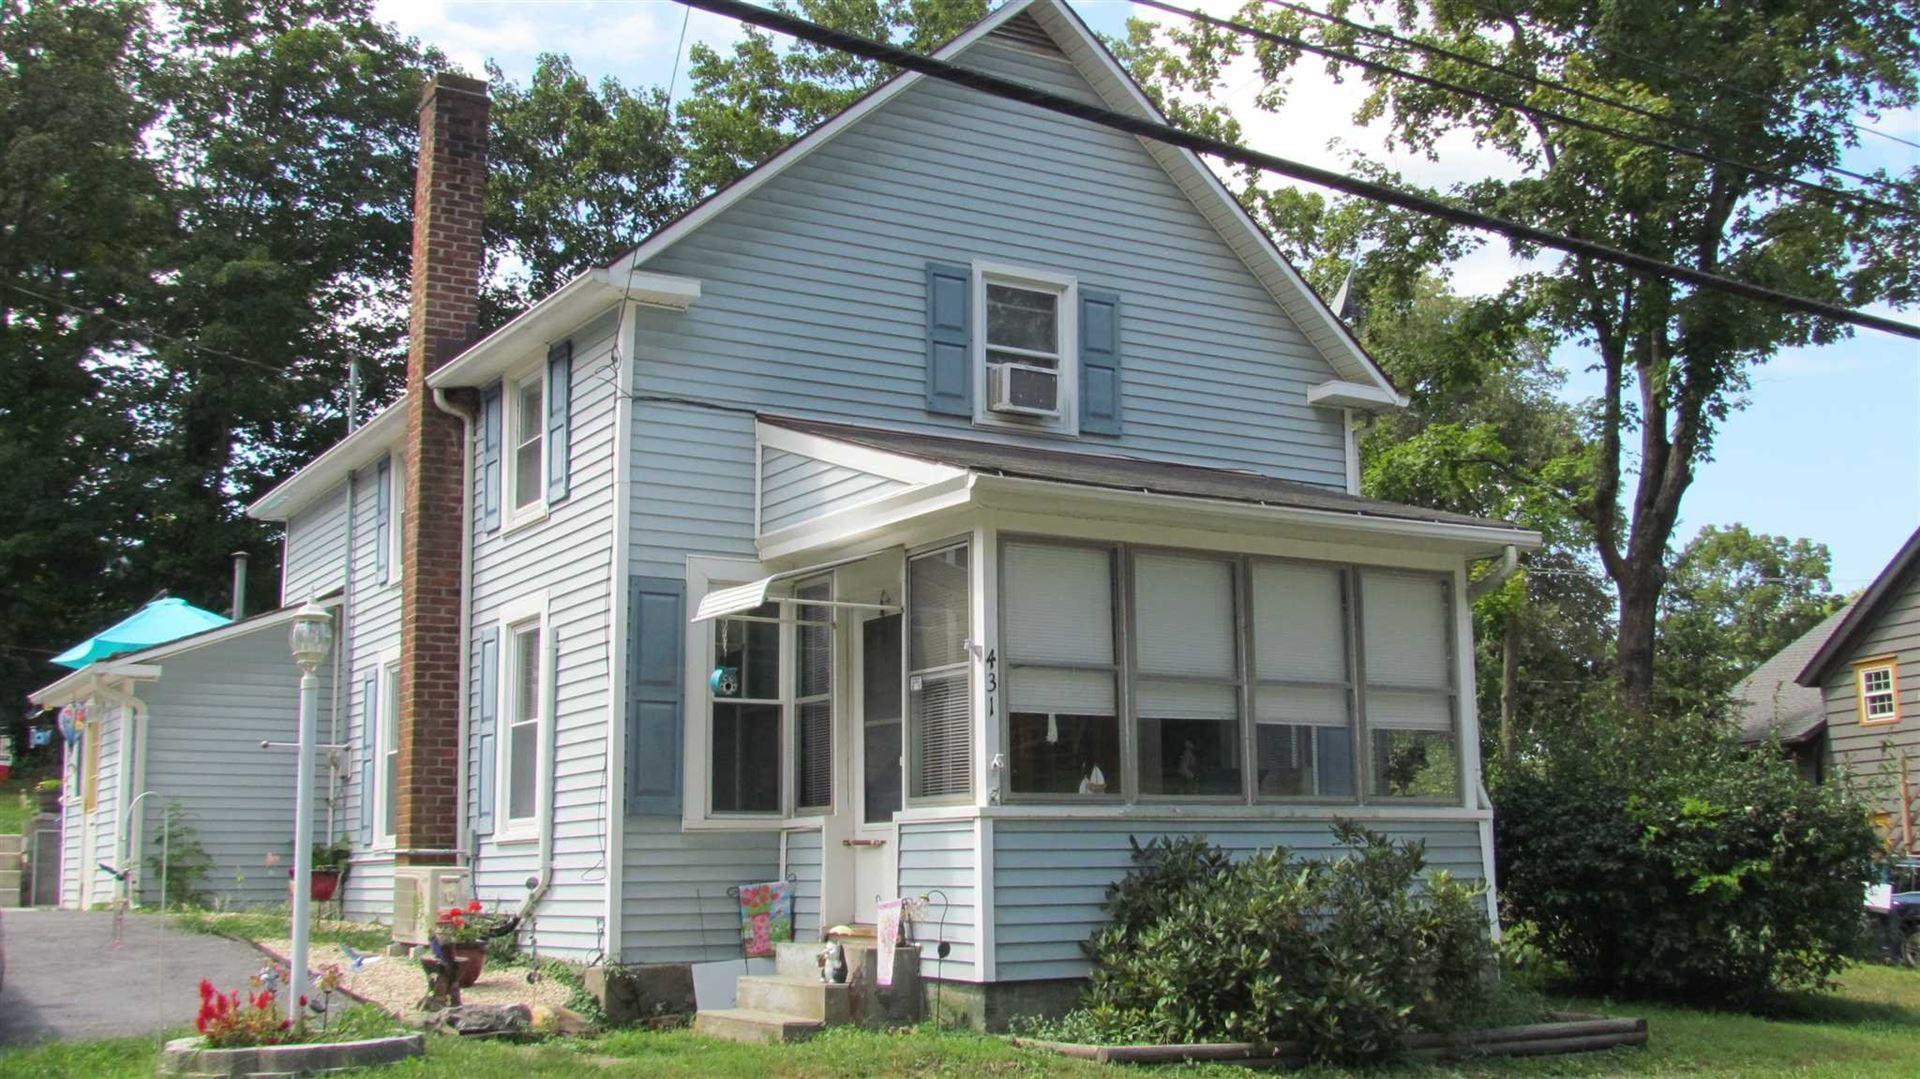 431 CLINTON CORNERS RD., Clinton Corners, NY 12514 - #: 403603